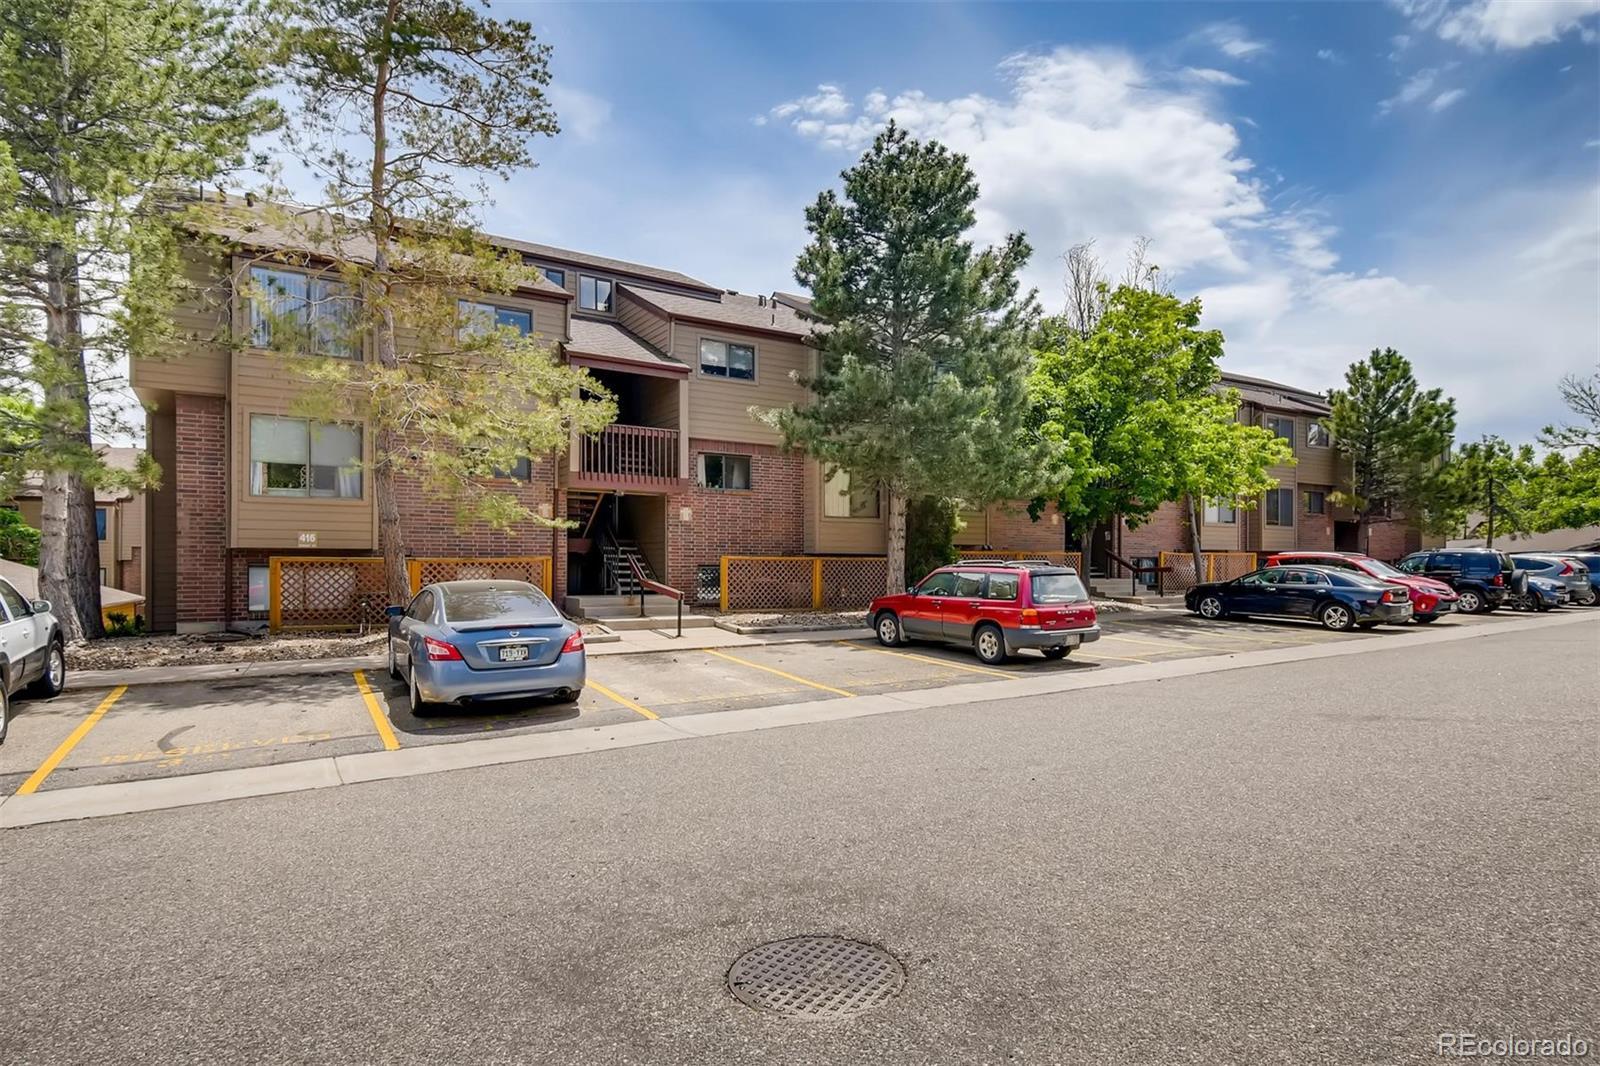 MLS# 3625998 - 19 - 416 Wright Street #103, Lakewood, CO 80228